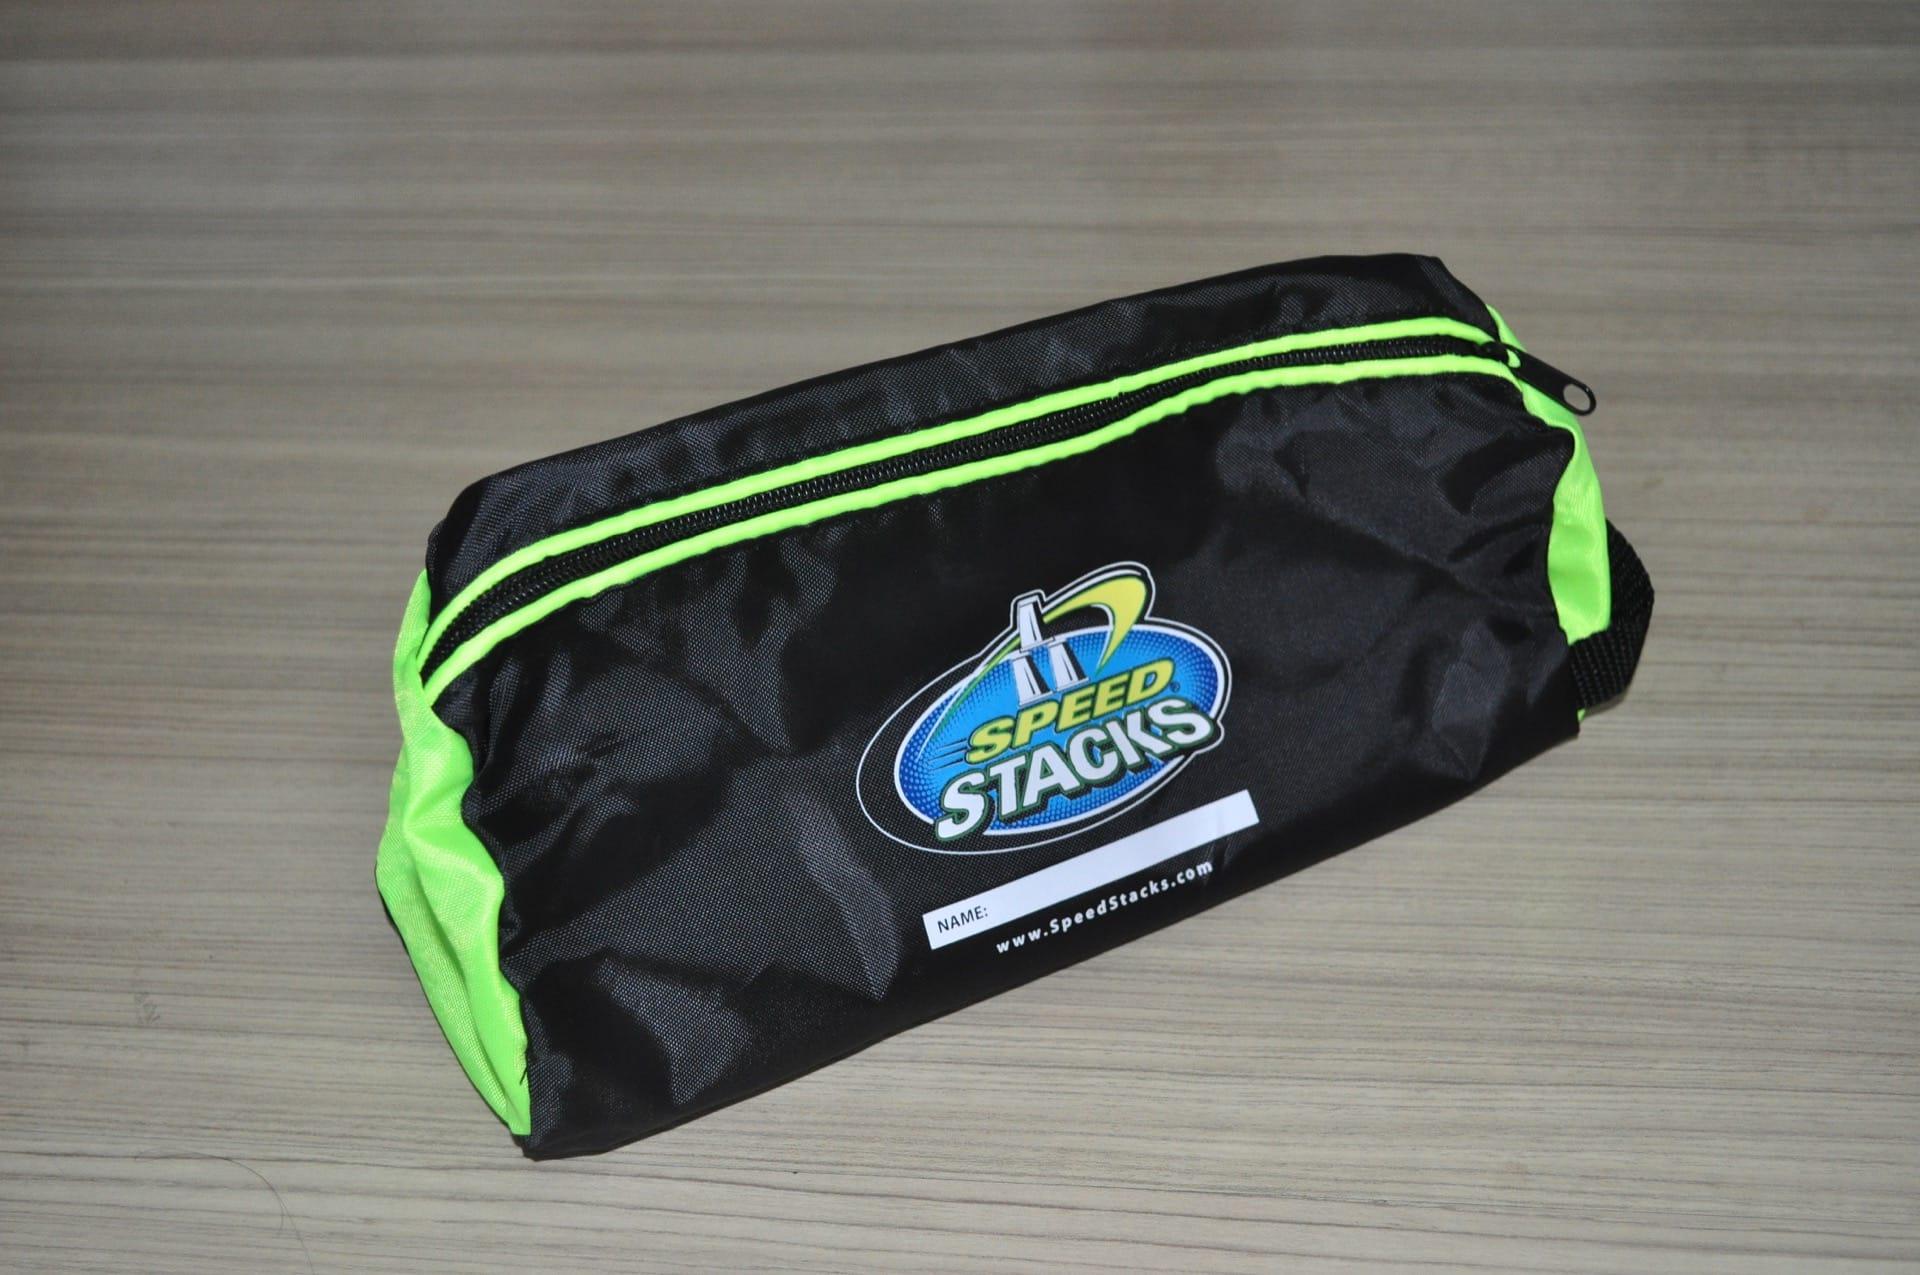 SpeedStacks StackmatPro BAG